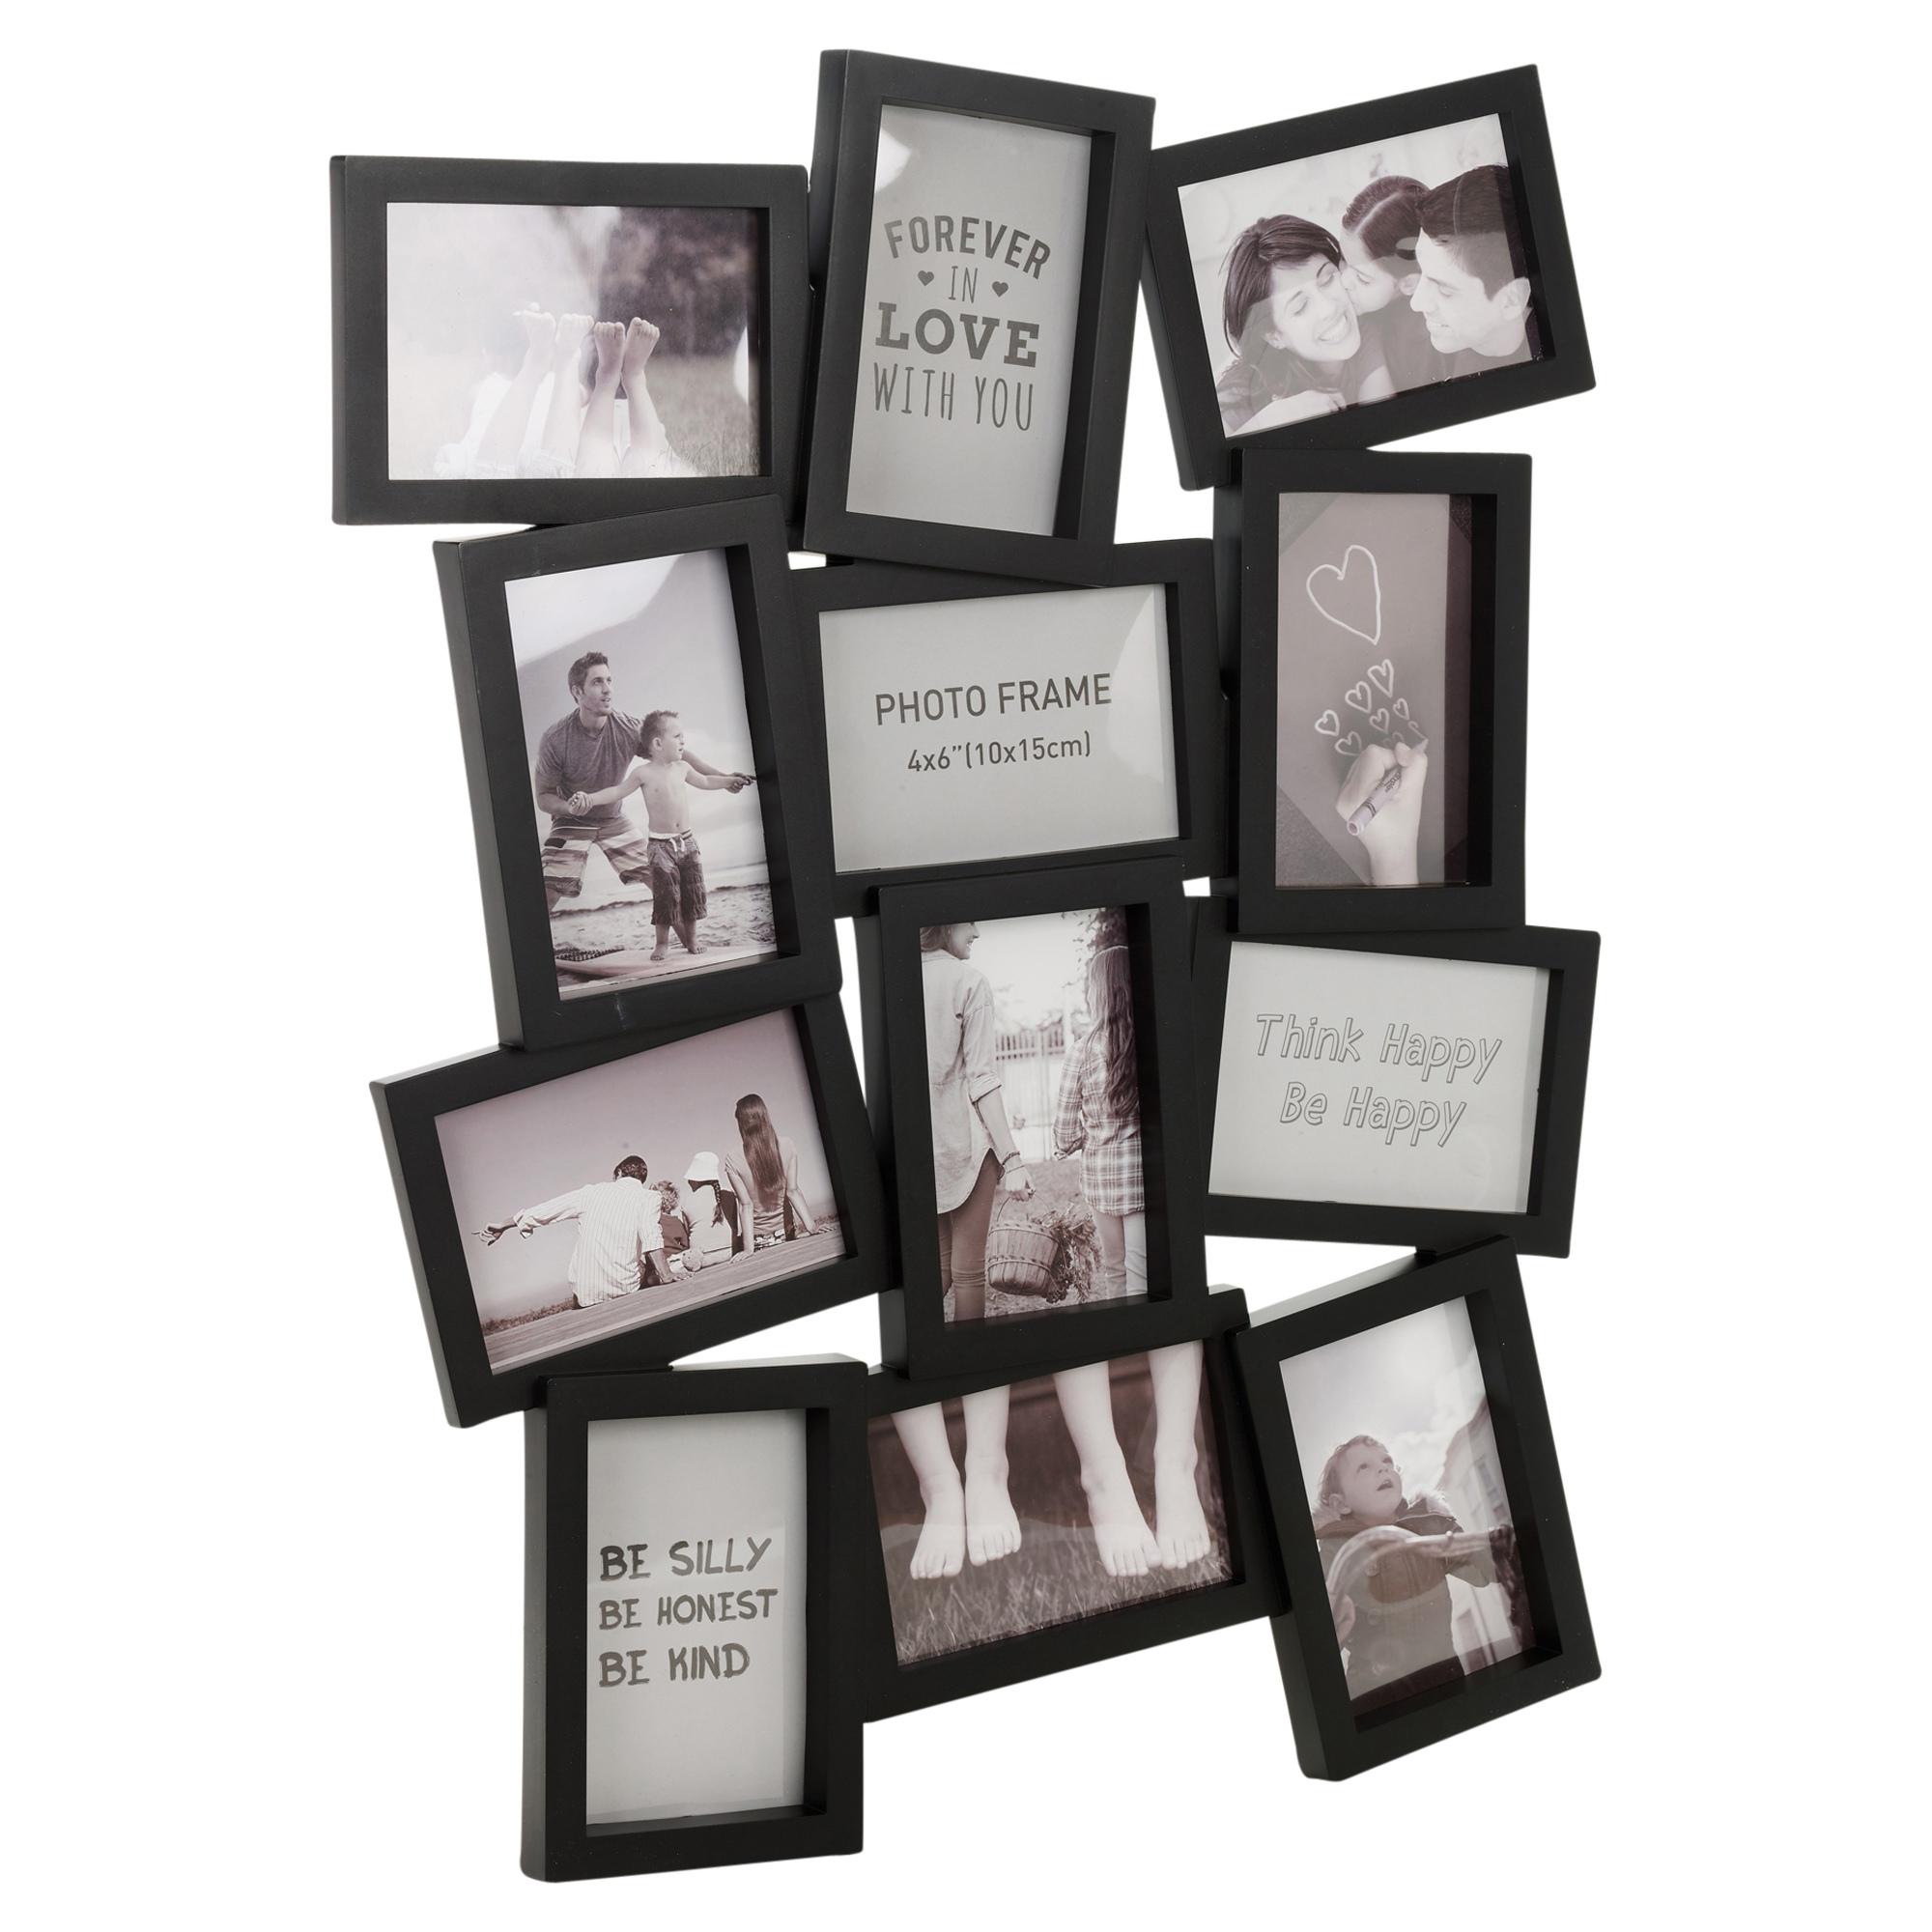 11 or 12 coloured large multi picture photo frame collage aperture wall decor ebay. Black Bedroom Furniture Sets. Home Design Ideas